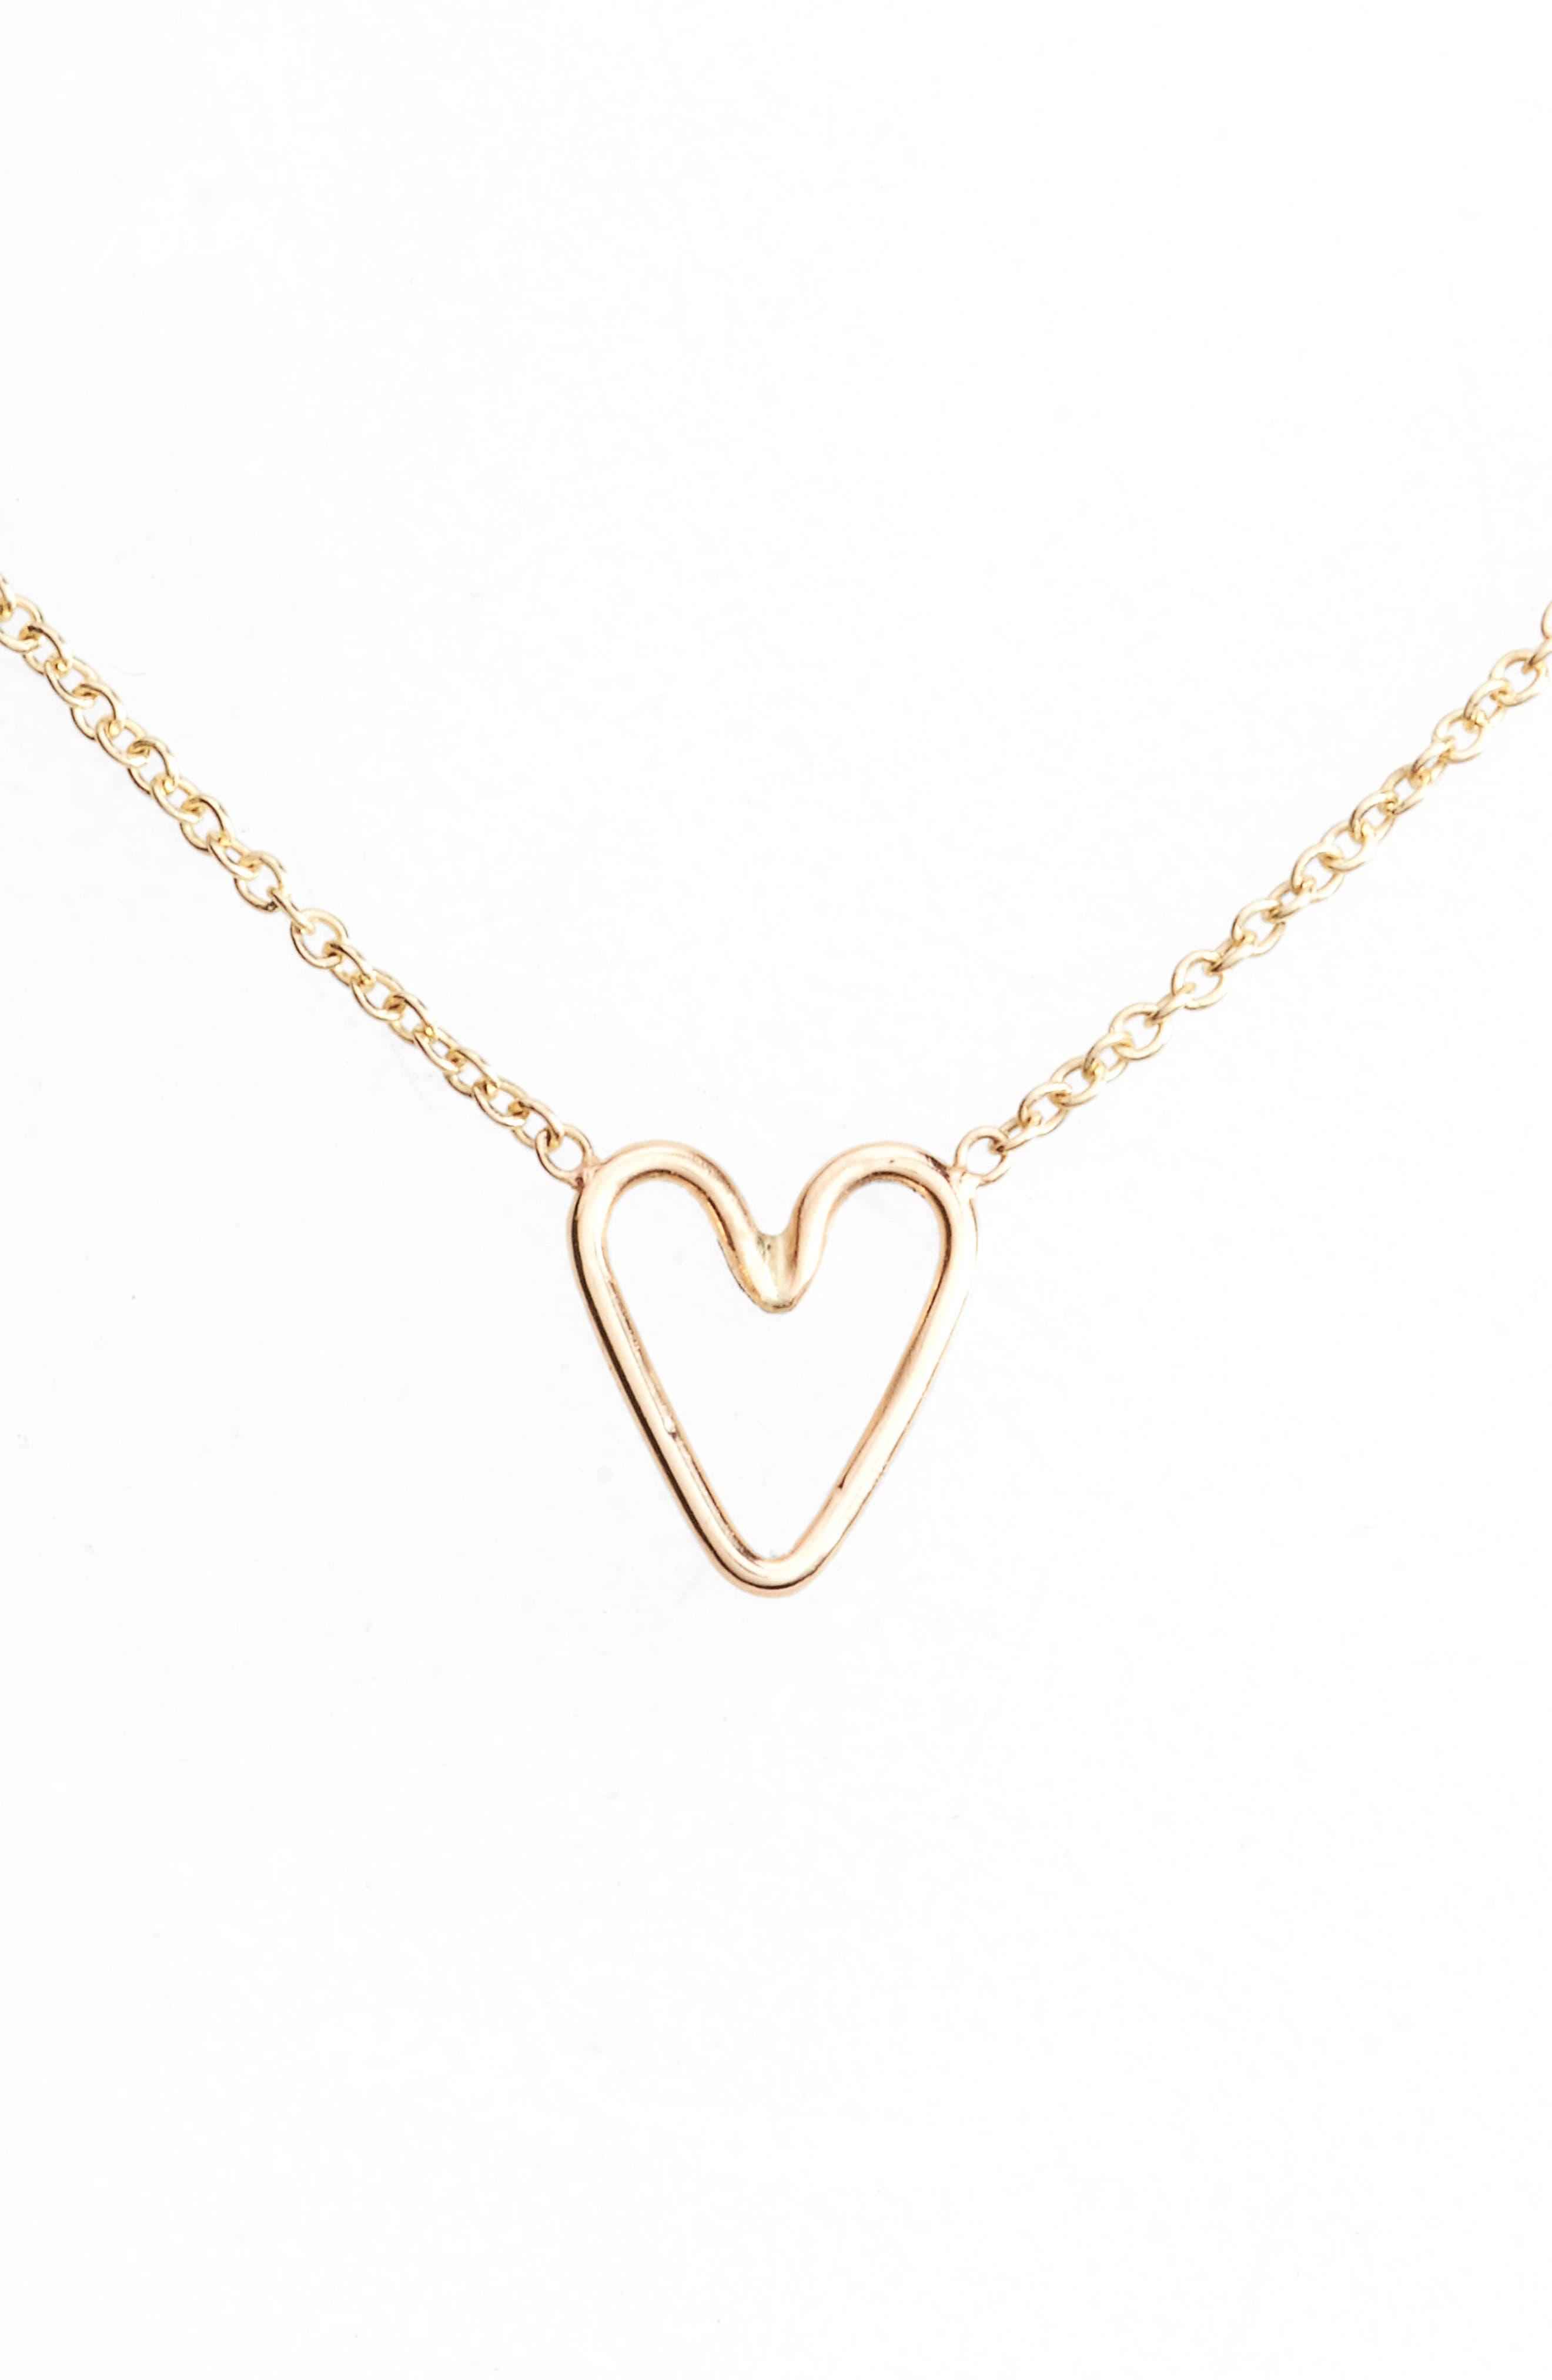 Main Image - Zoë Chicco Tiny Open Heart Pendant Necklace